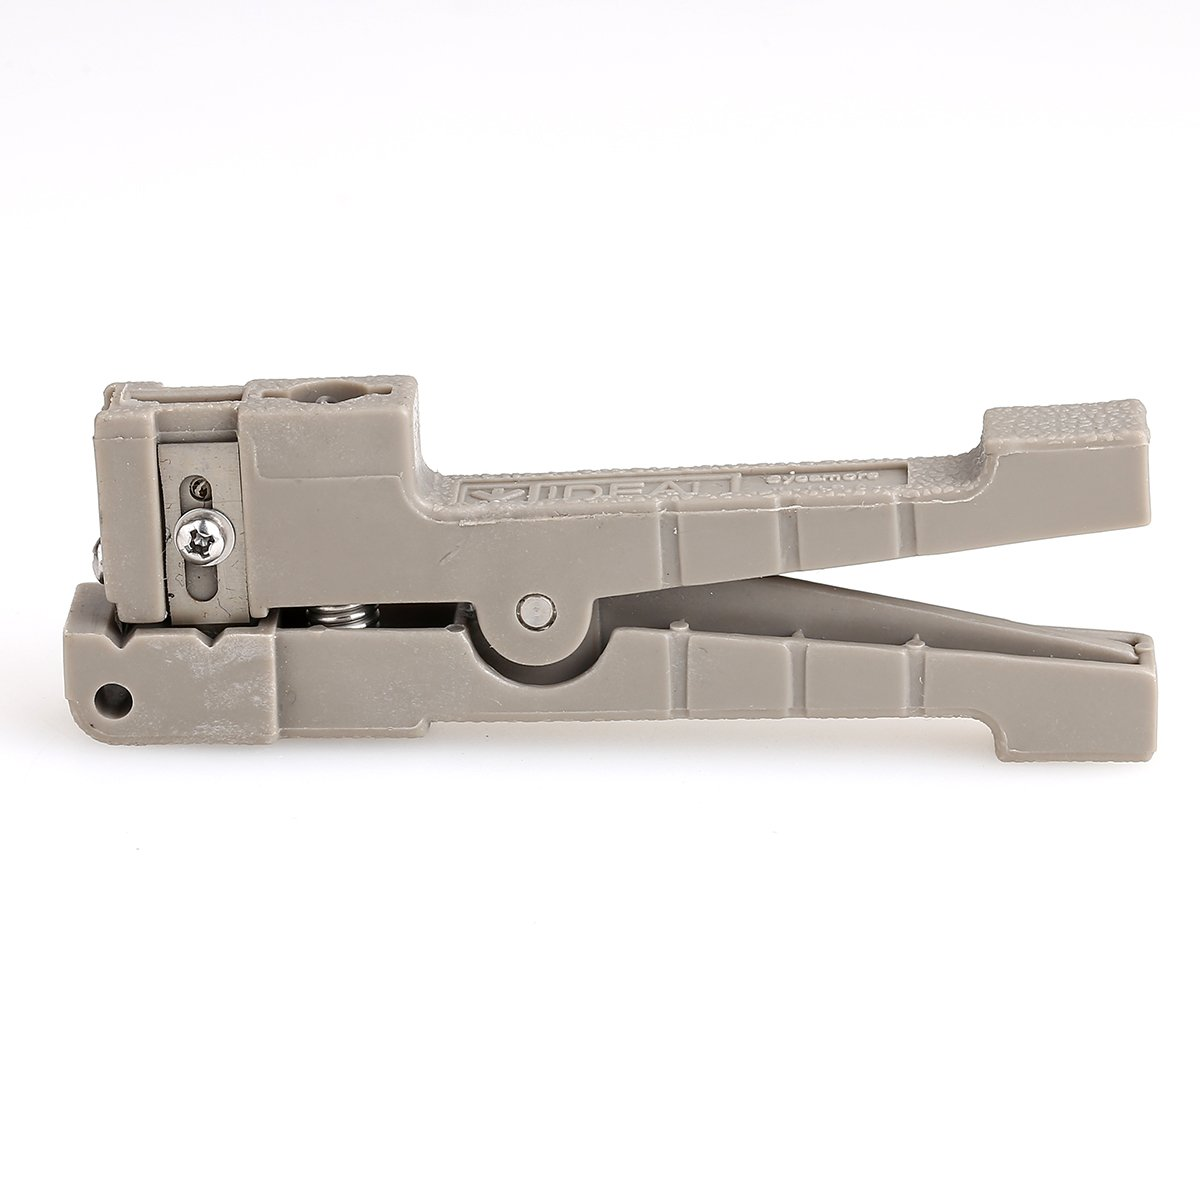 Strumento per fibra ottica per spelacavi Ideal 45-162 per cavi coassiali